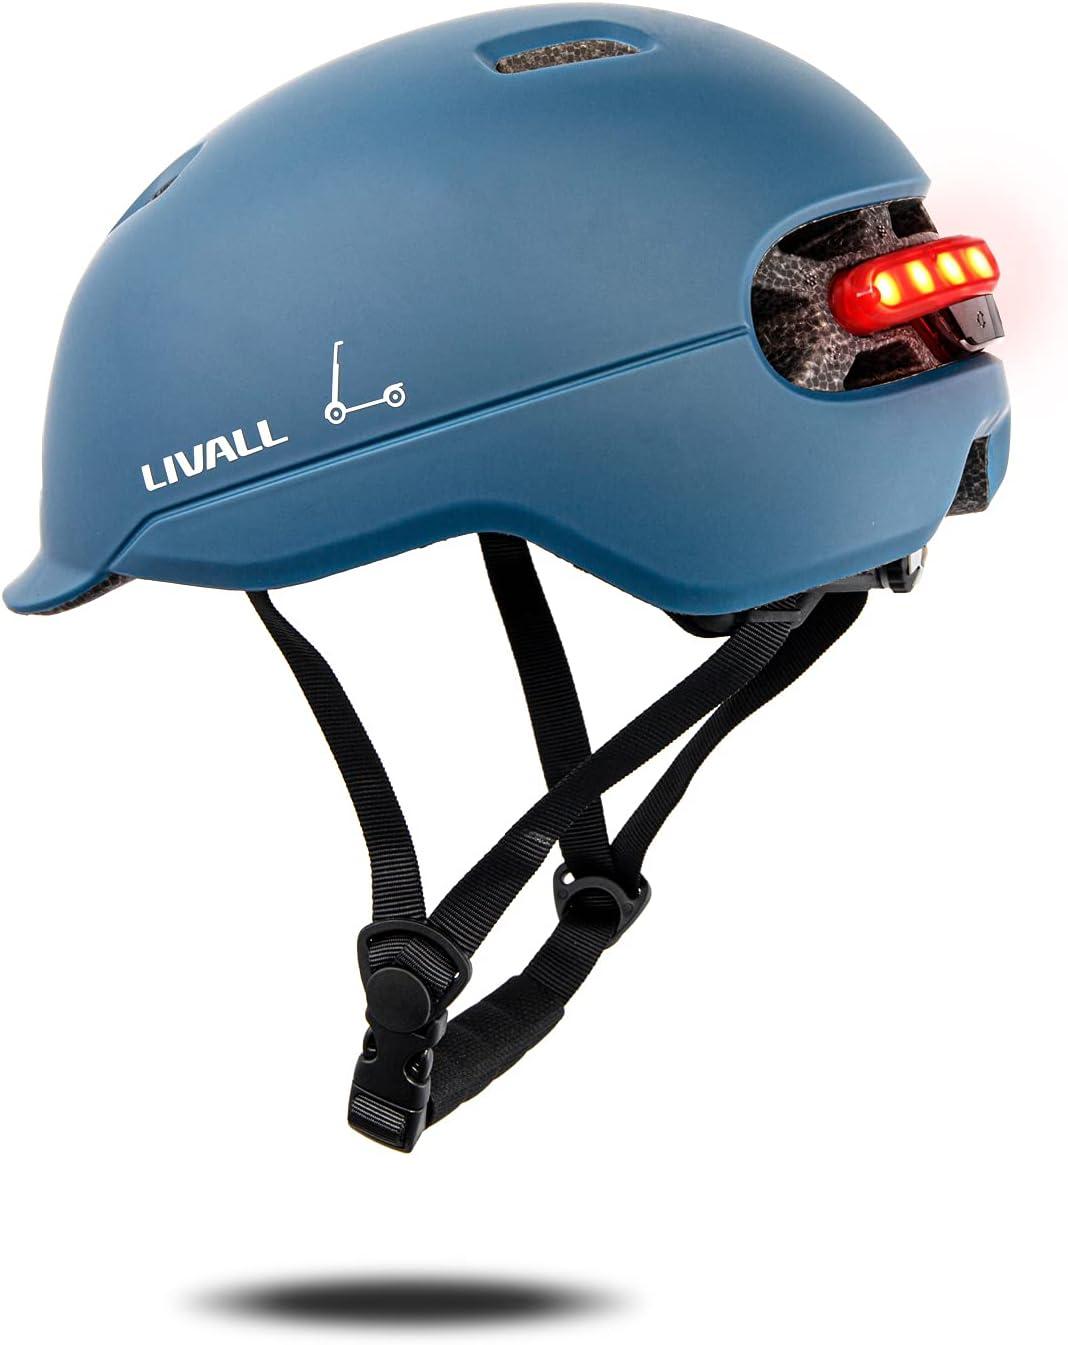 LIVALL Smart Helmet Adult Bike Auto LED Rea excellence New sales with Sensor